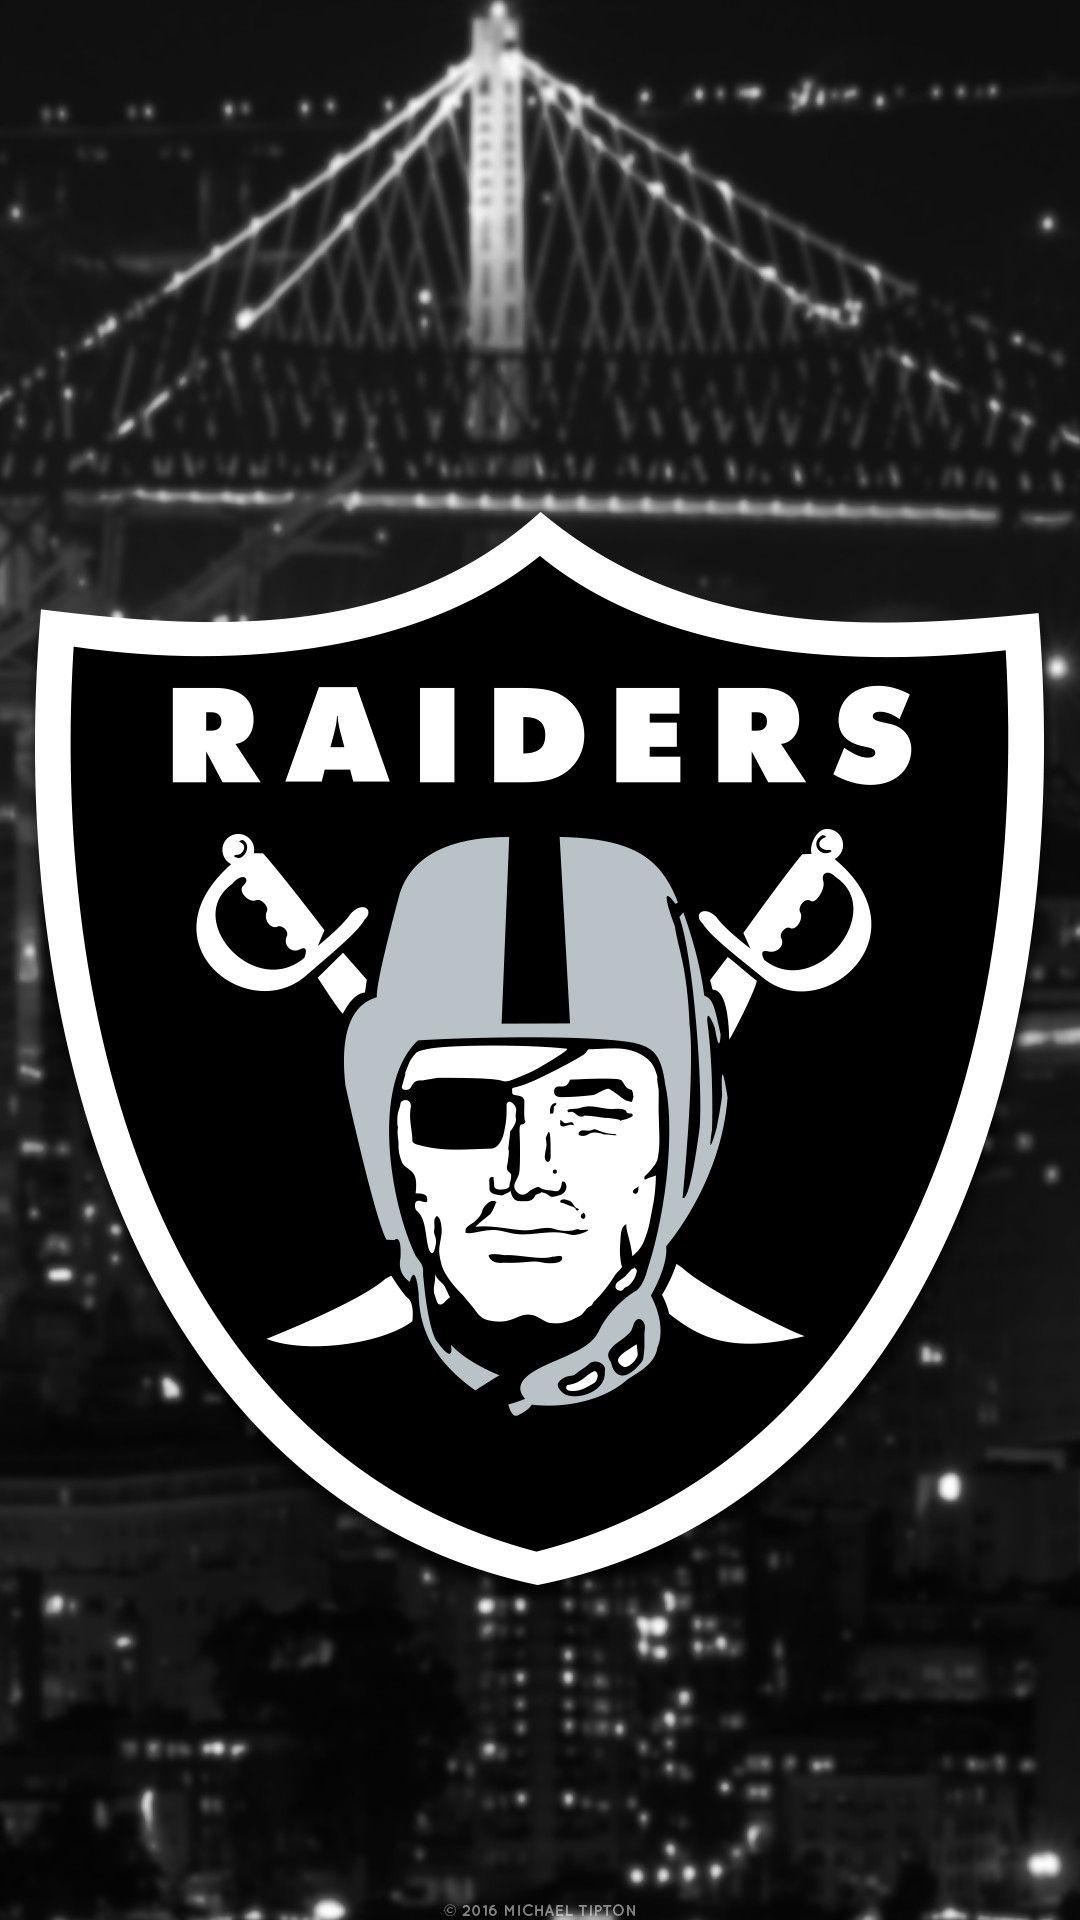 Gangster Raider Wallpaper In 2020 Oakland Raiders Wallpapers Raiders Wallpaper Oakland Raiders